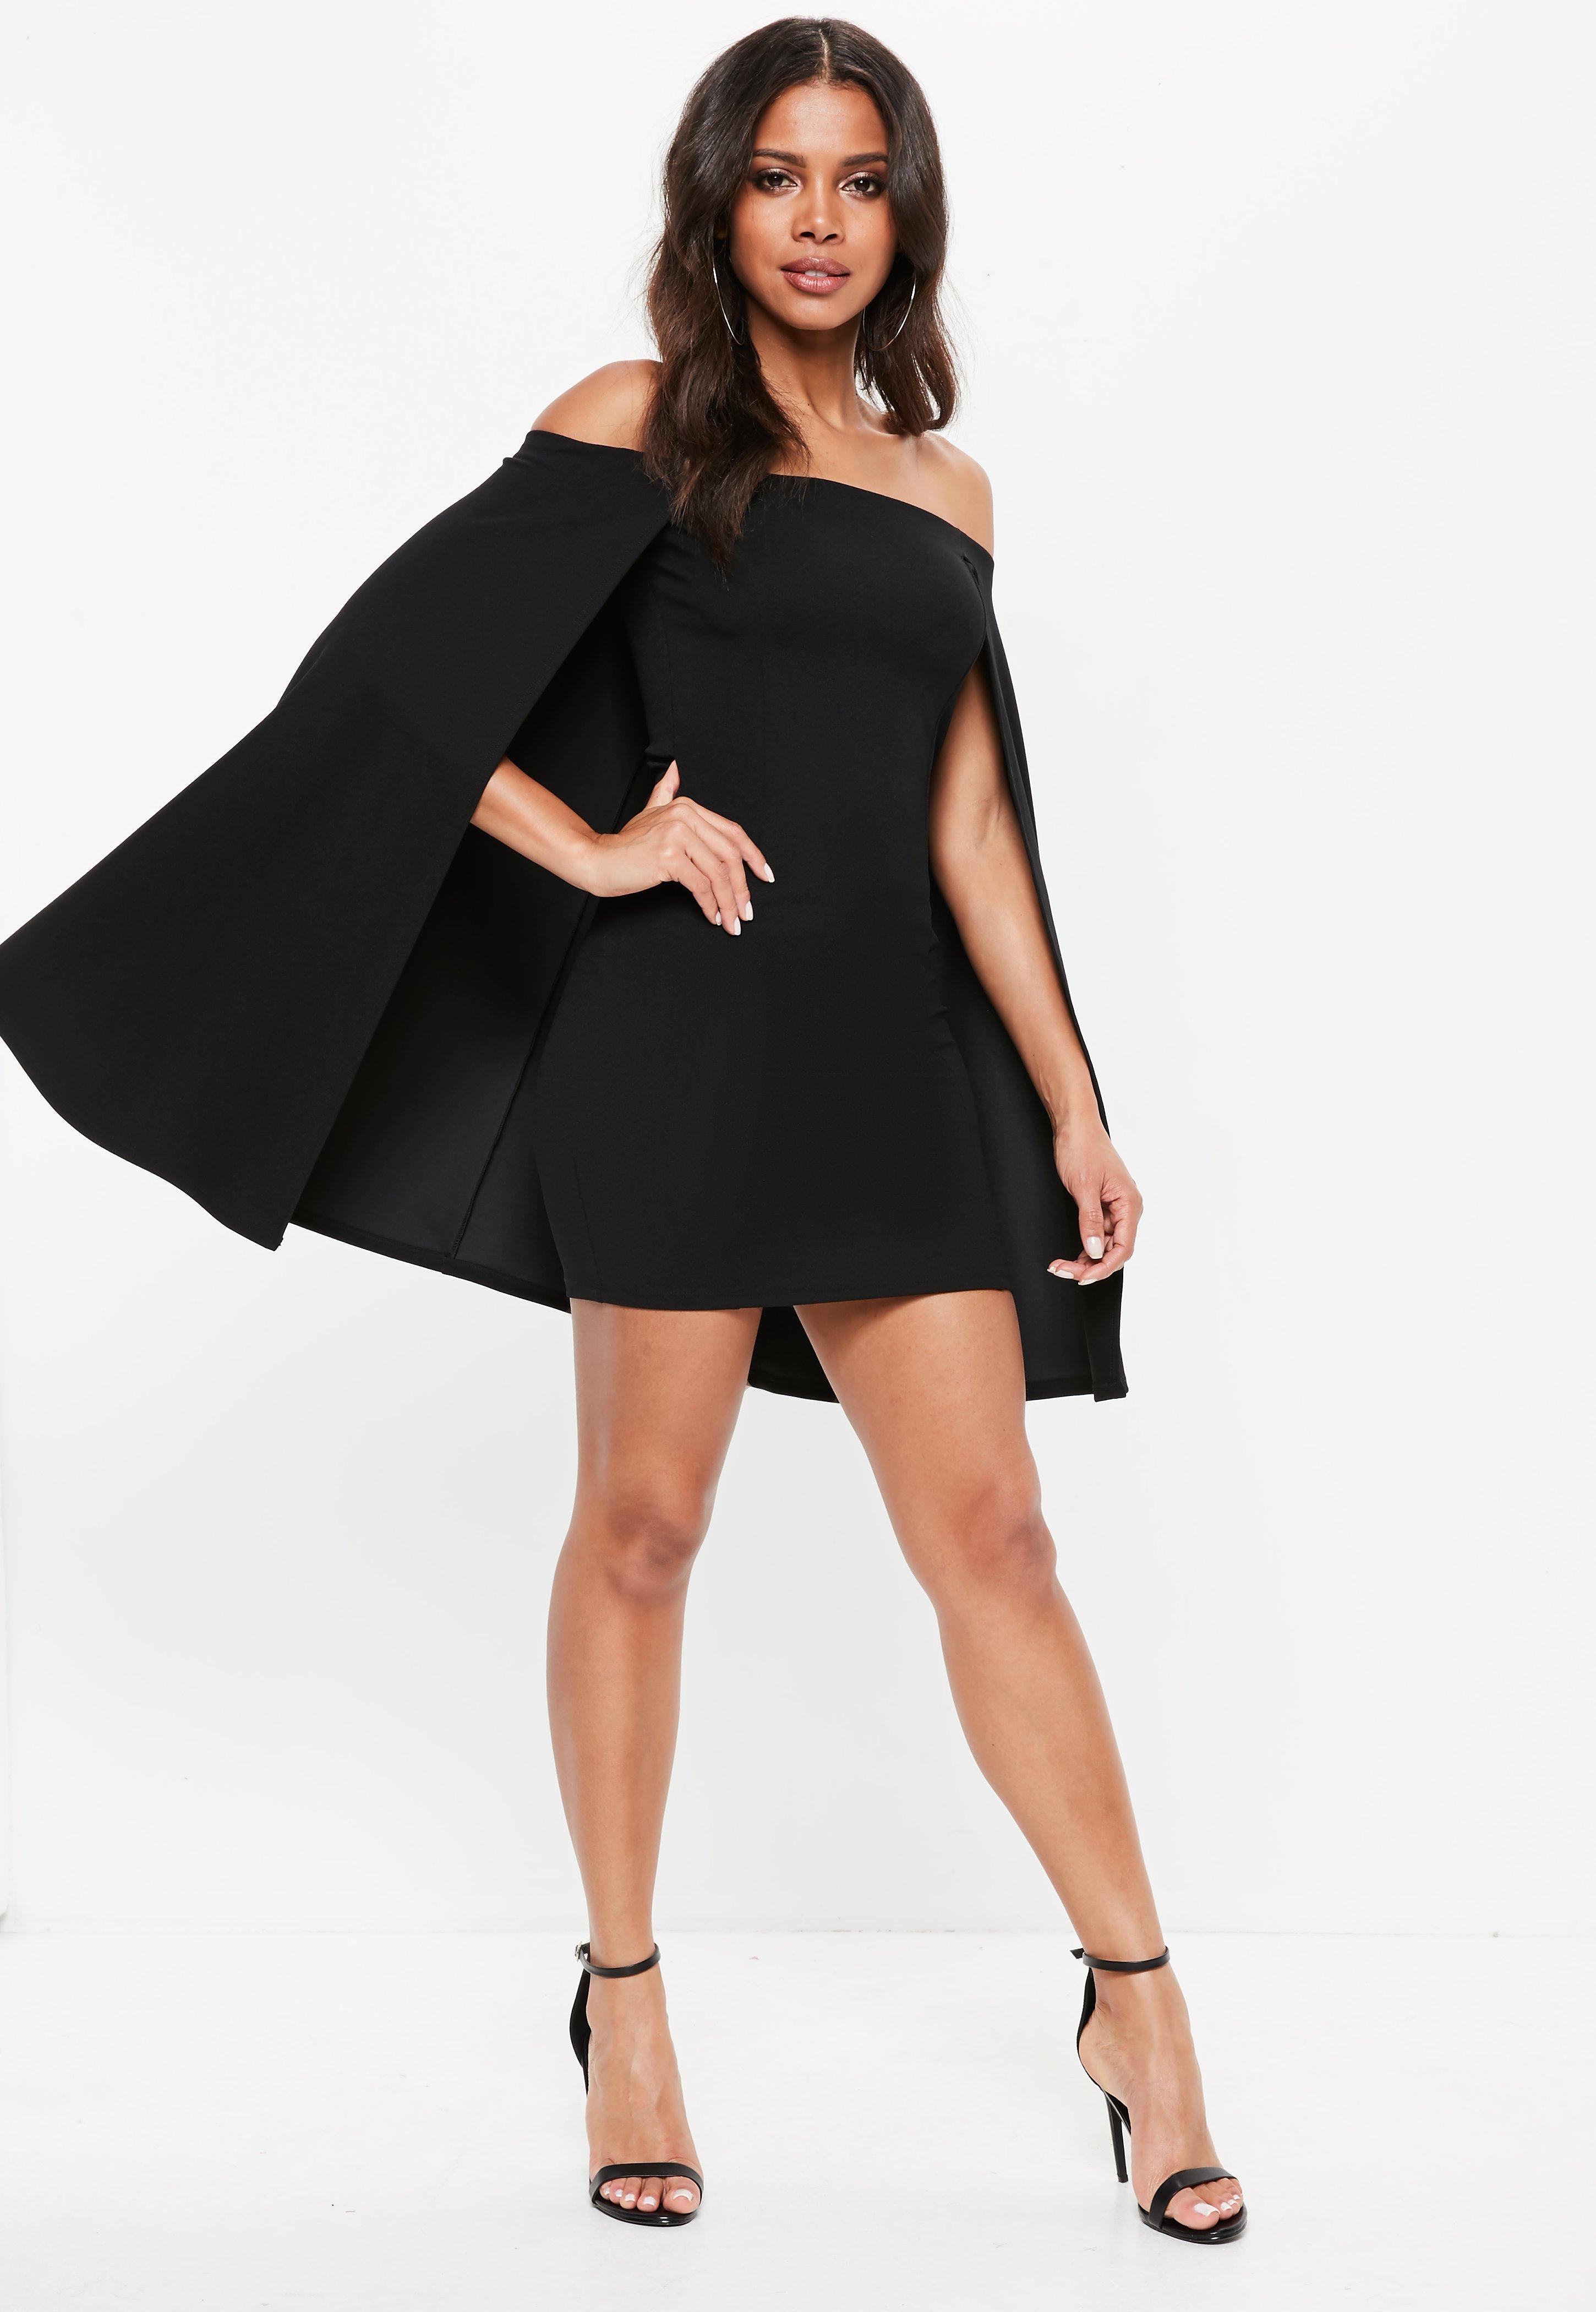 Black Dresses - Little Black Dresses & LBDs | Missguided